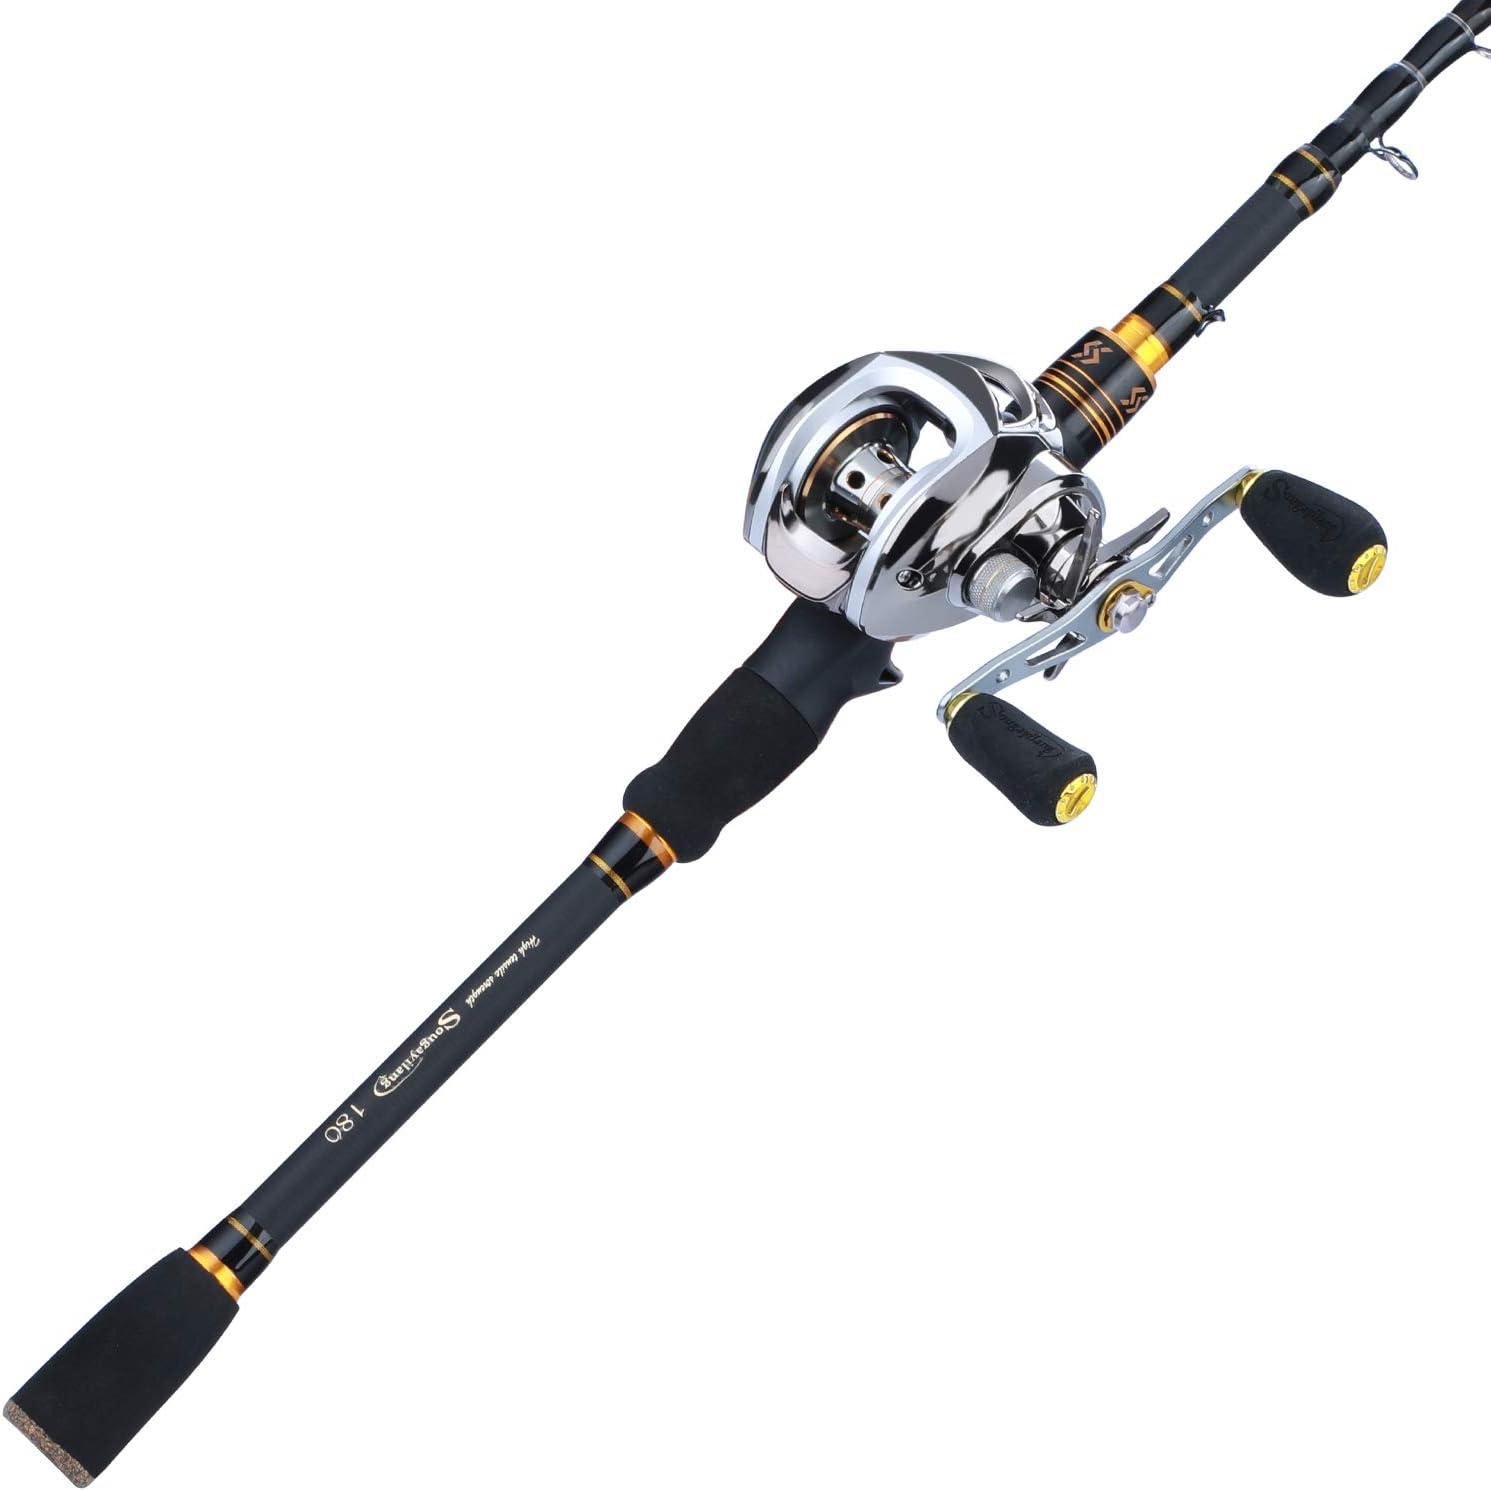 Sougayilang Baitcaster Fishing Rod and Reel Combo, Ultra Light Baitcasting Fishing Reel for Travel Saltwater Freshwater and Beginner 5.9FT/6.9FT